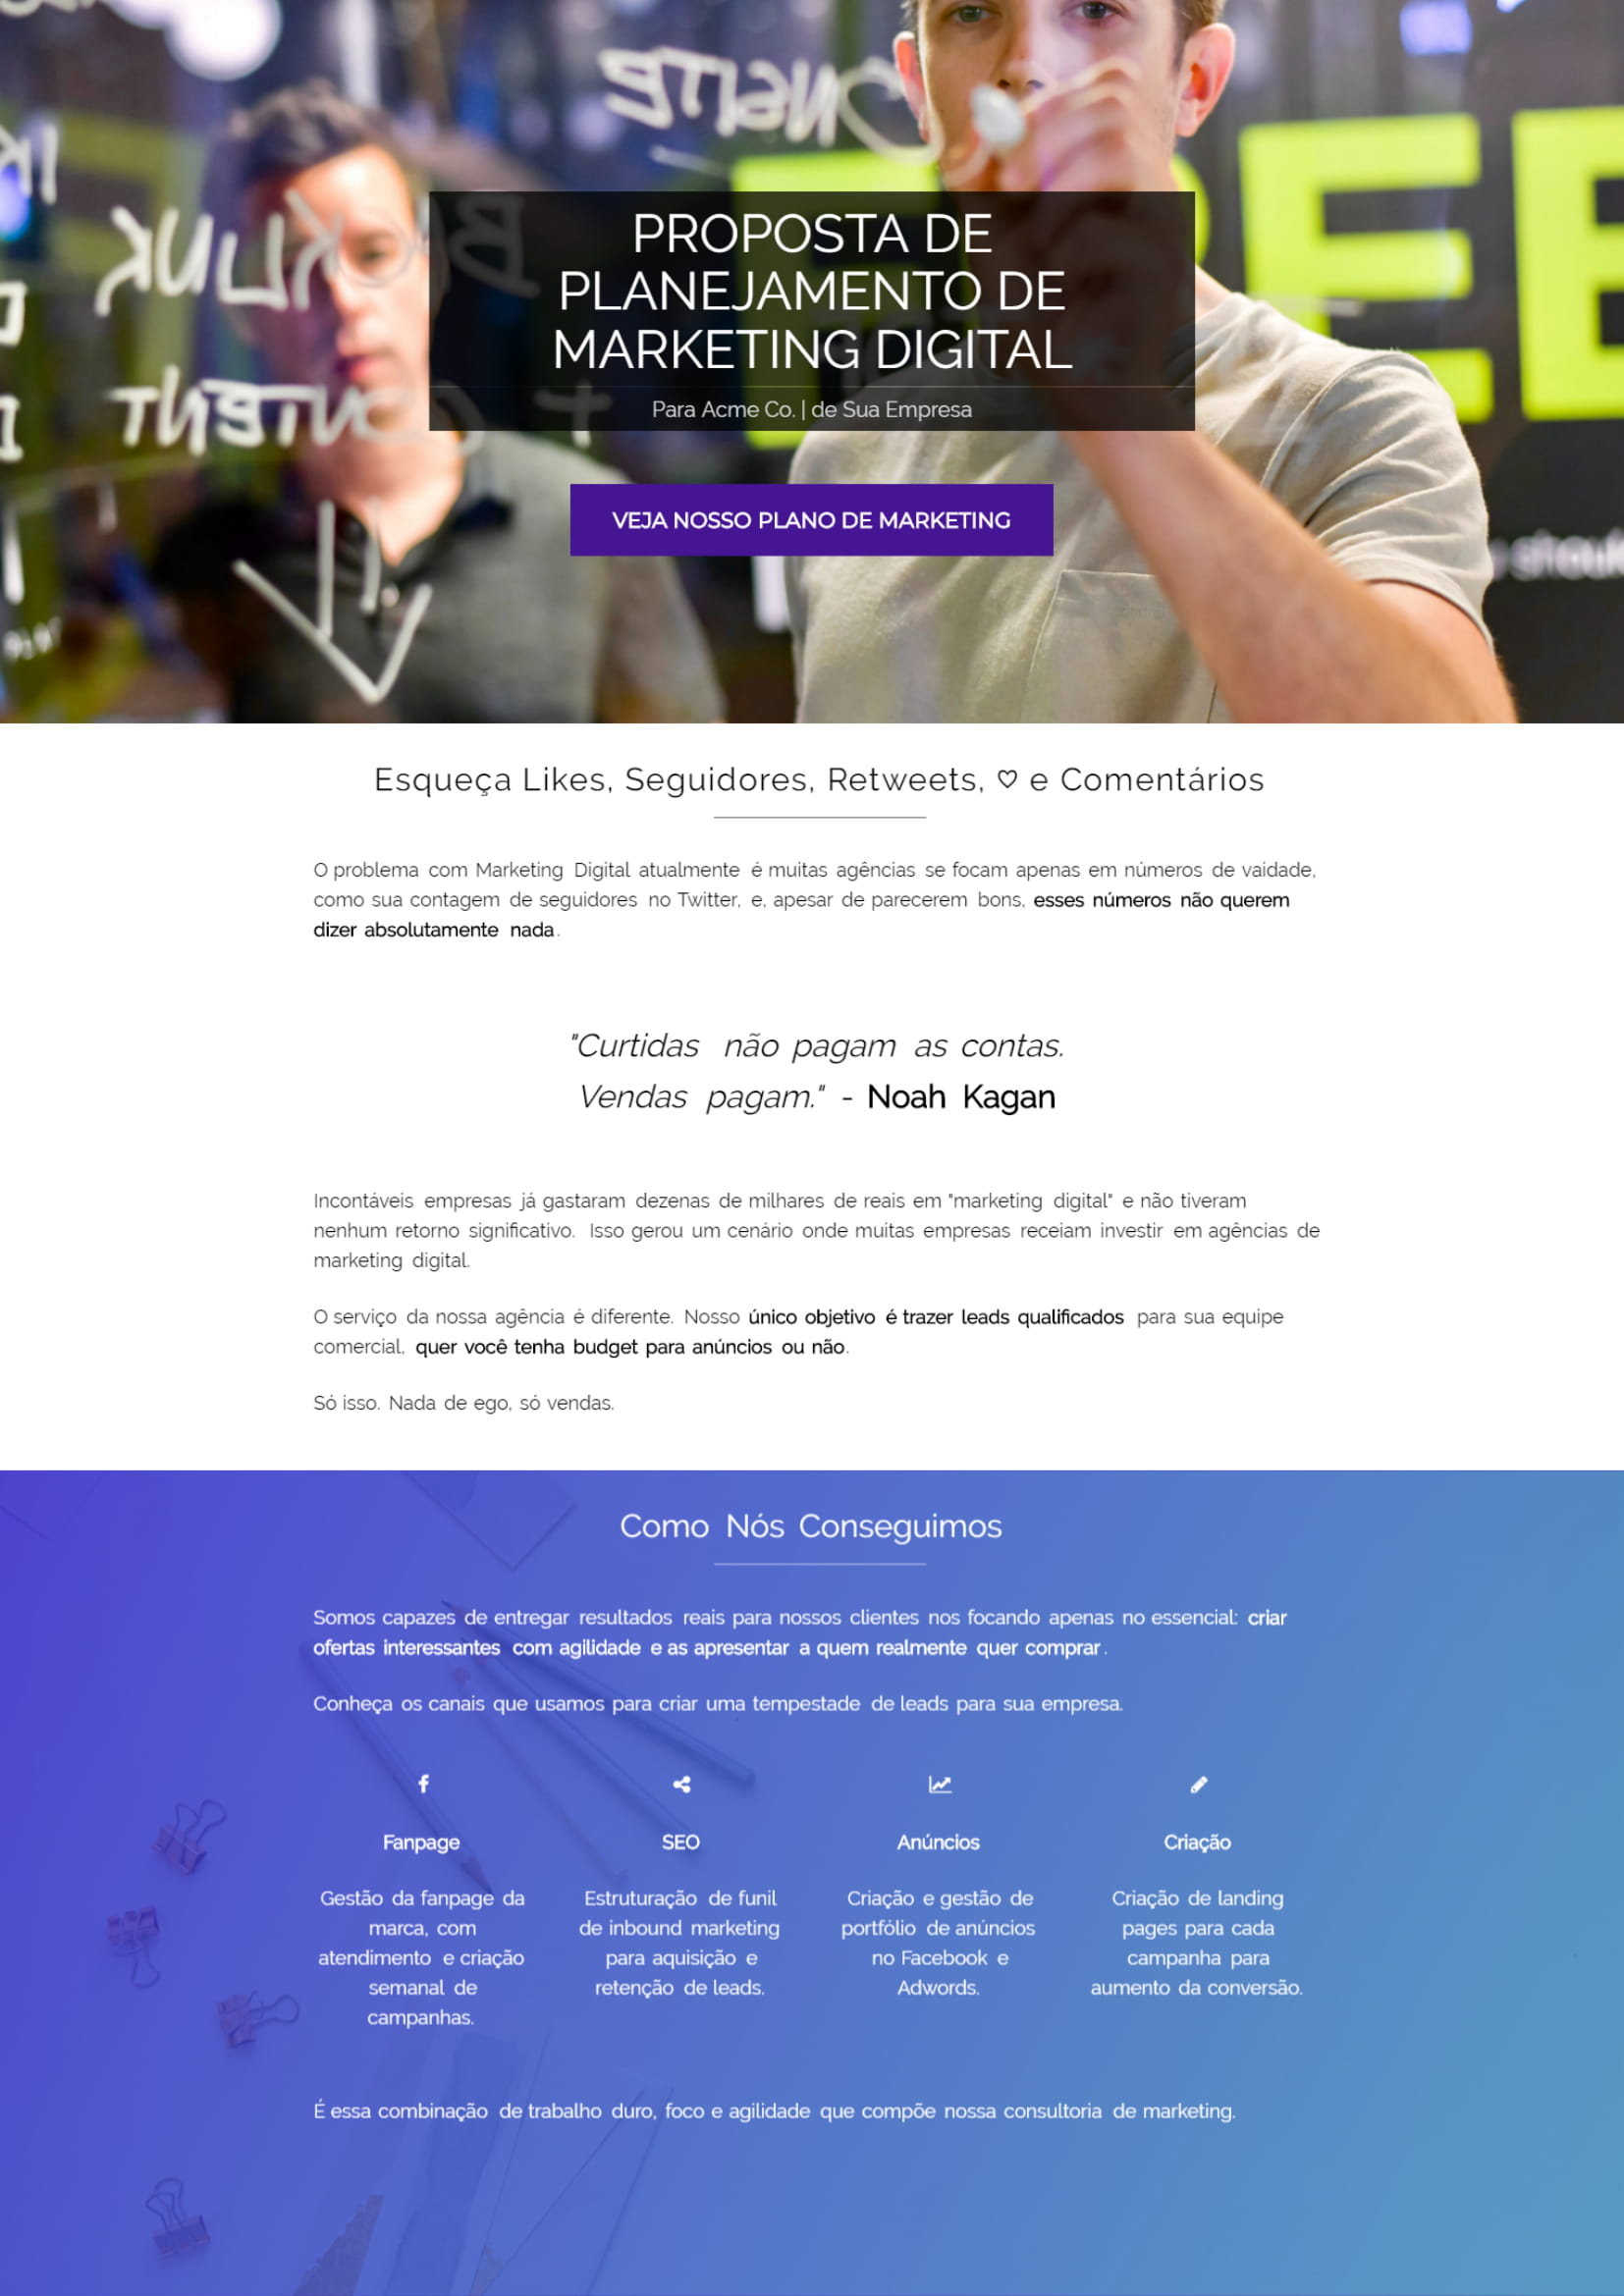 digital-marketing-proposal-template-2